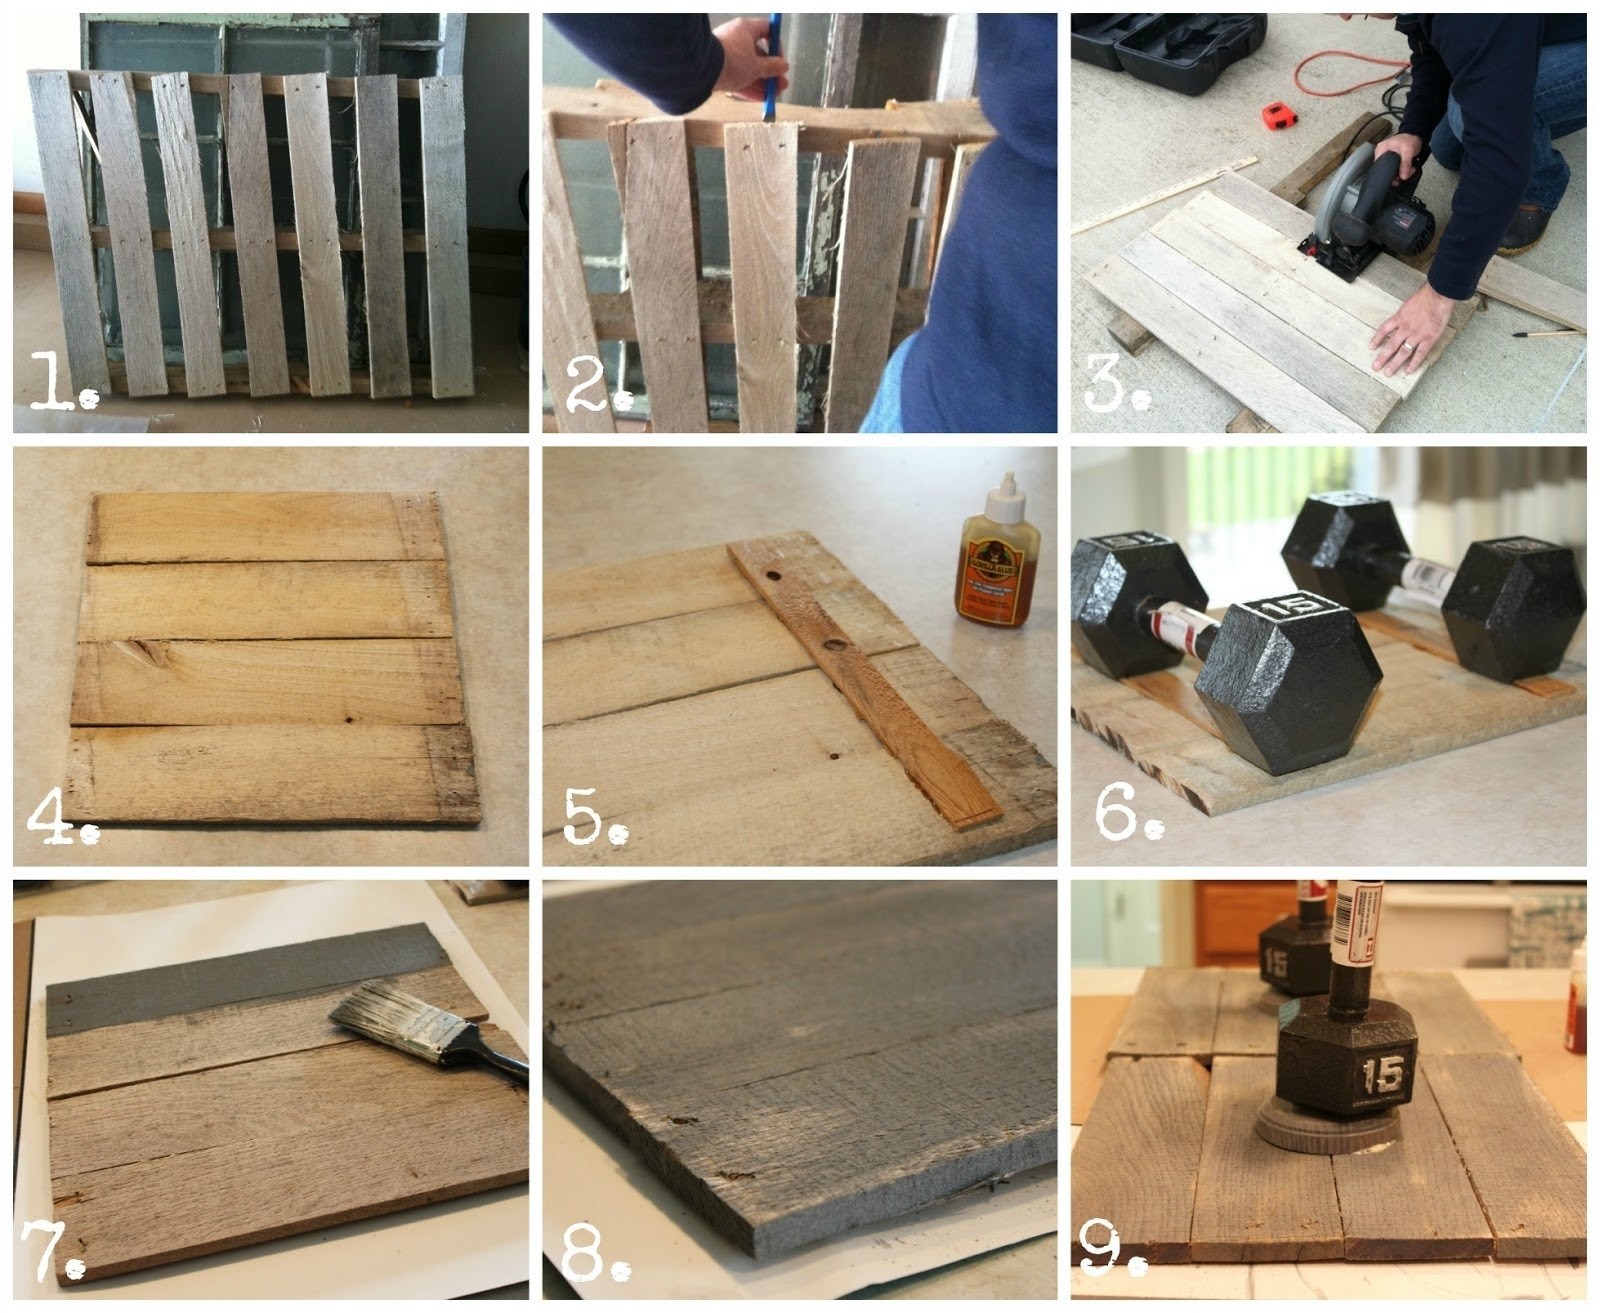 Fresh Wood Pallet Wall Art Trend How To Make Wall Art Out Of Pallets within Current Pallet Wall Art